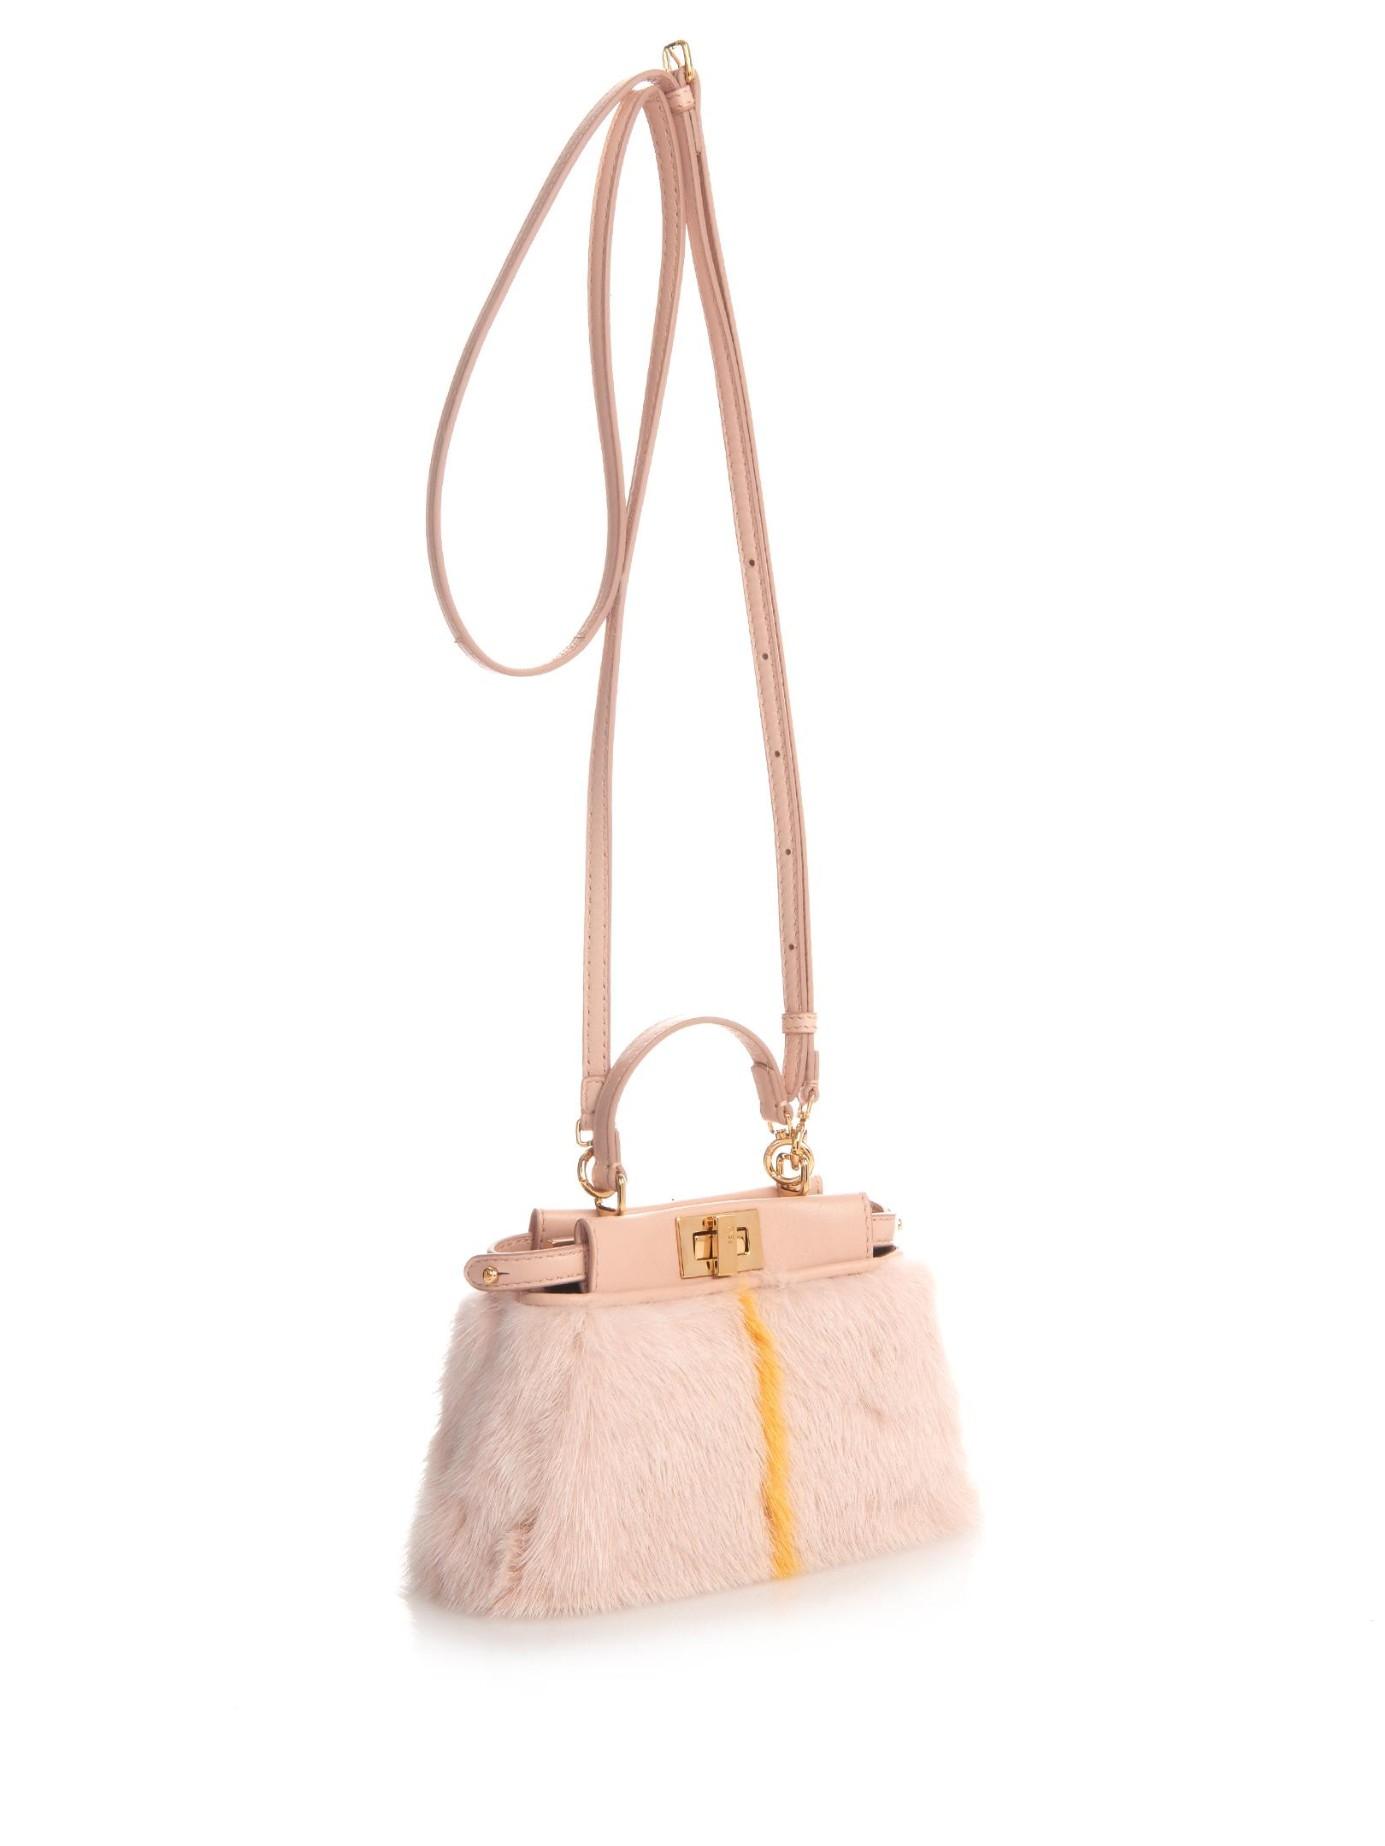 66345eb7f6ec Lyst - Fendi Micro Peekaboo Mink-Fur Cross-Body Bag in Pink